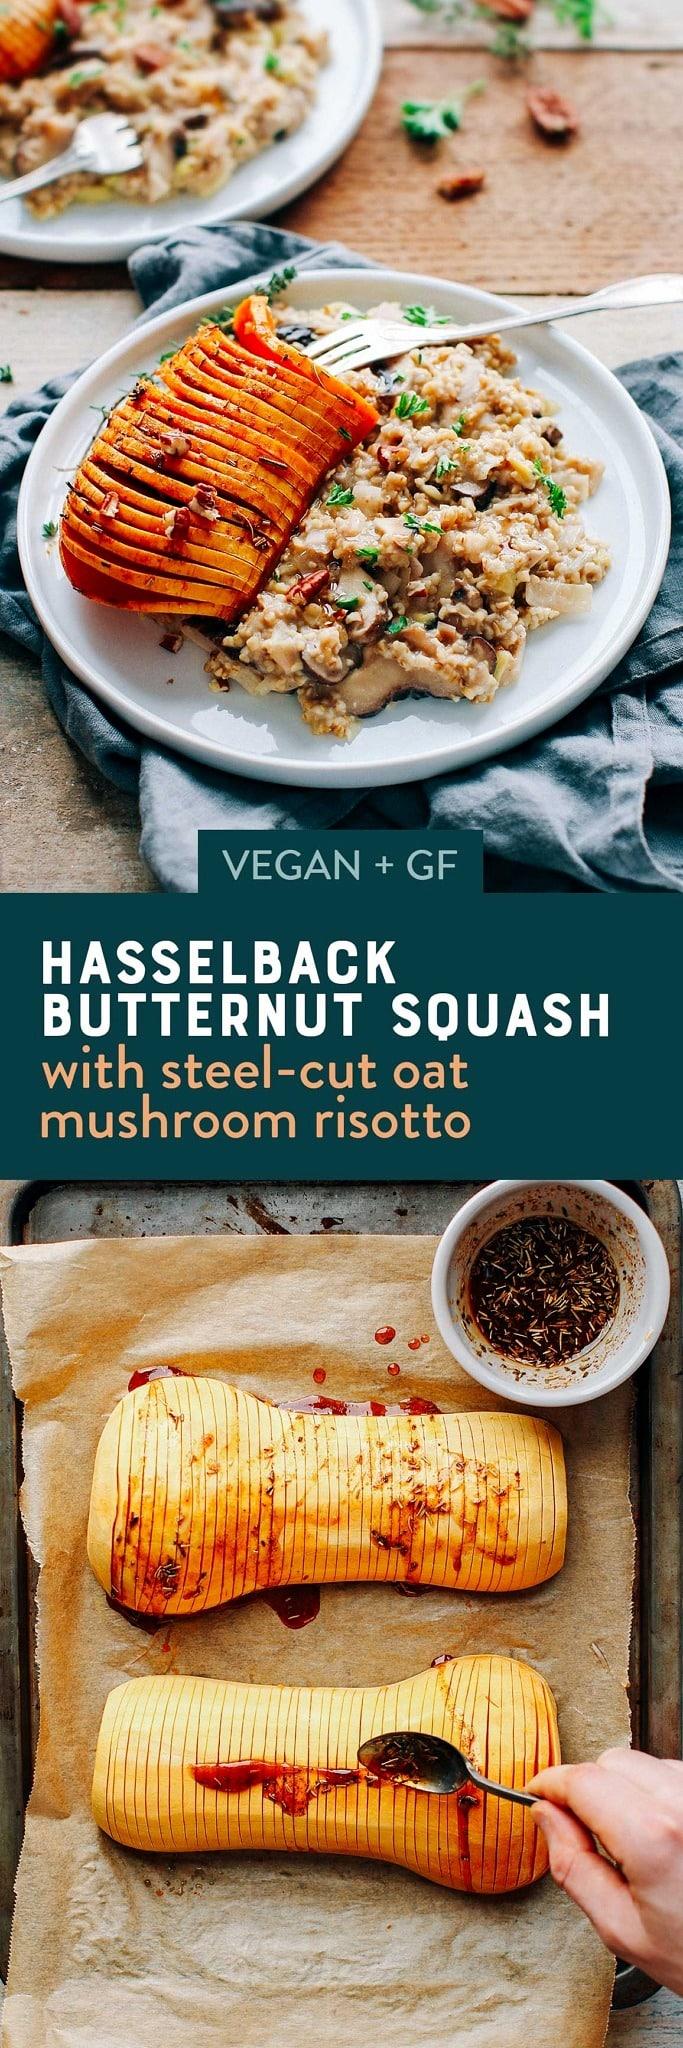 Hasselback Butternut Squash with Steel-Cut Oat Mushroom Risotto